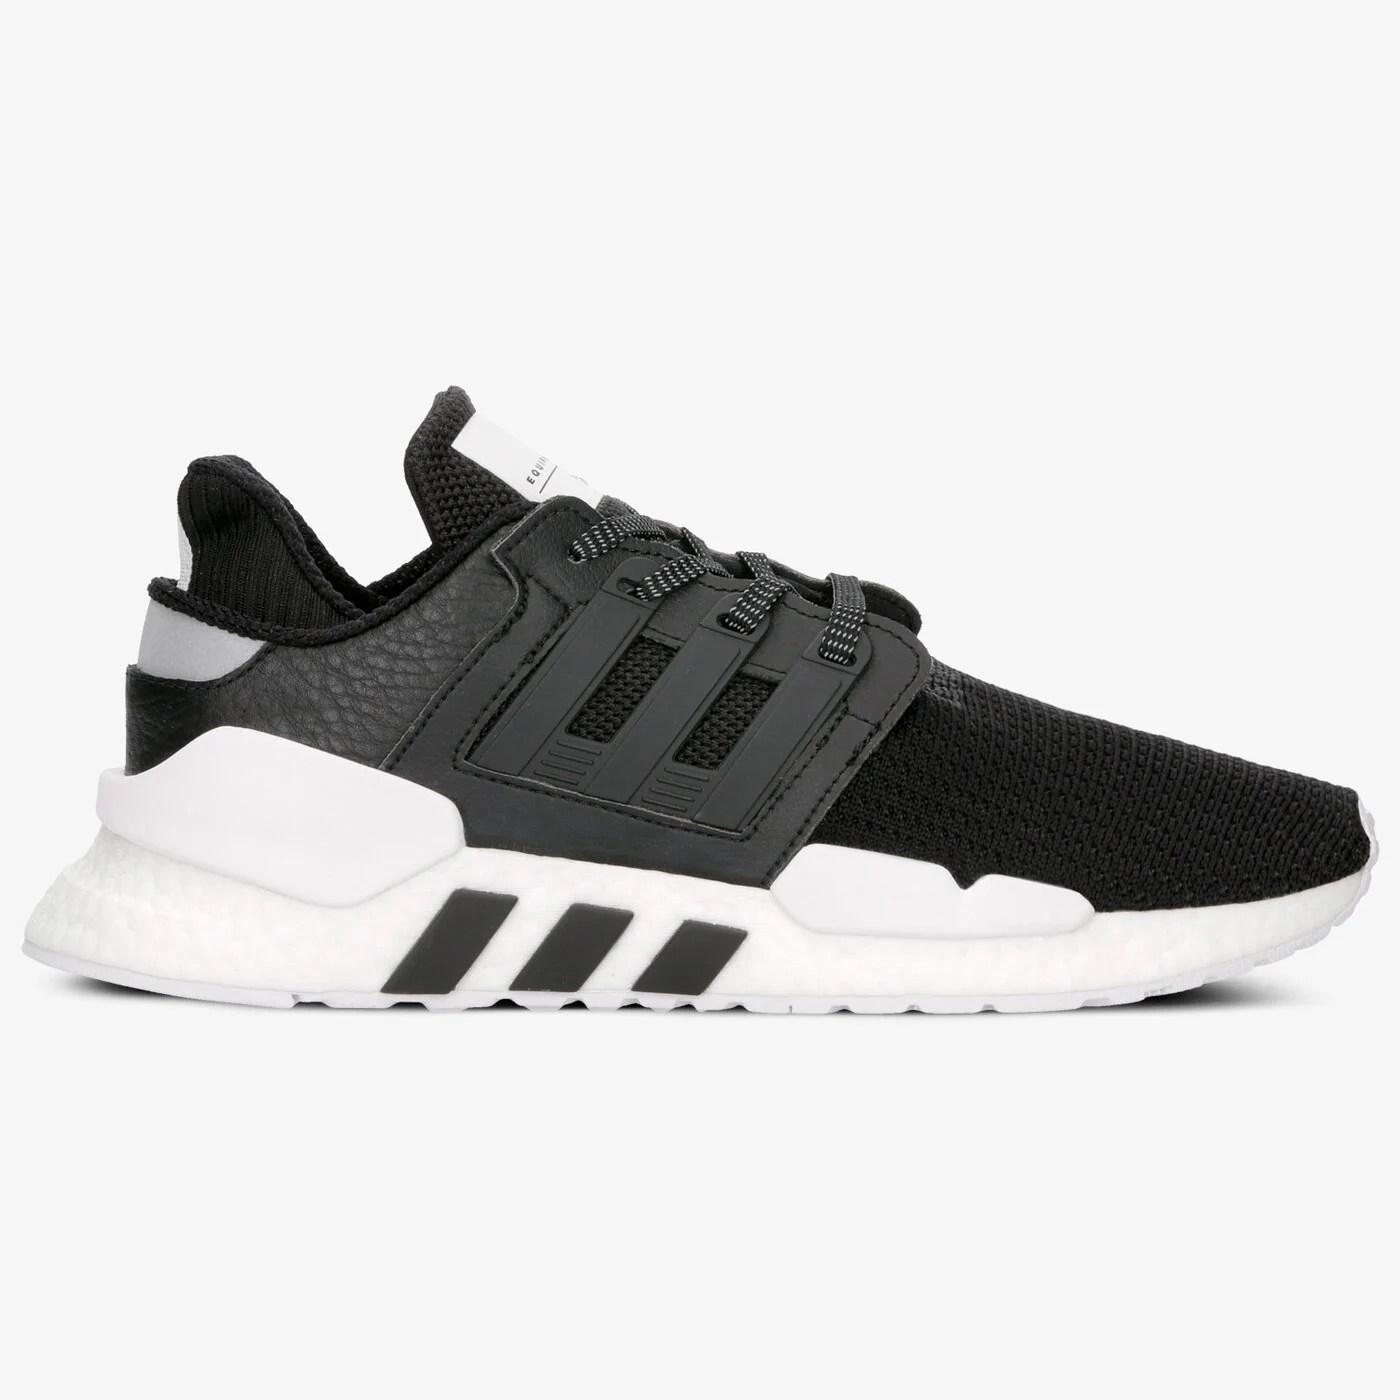 ADIDAS EQT SUPPORT 91/18 BD7793   SCHWARZ   109.99 €   Sneaker   Sizeer.de